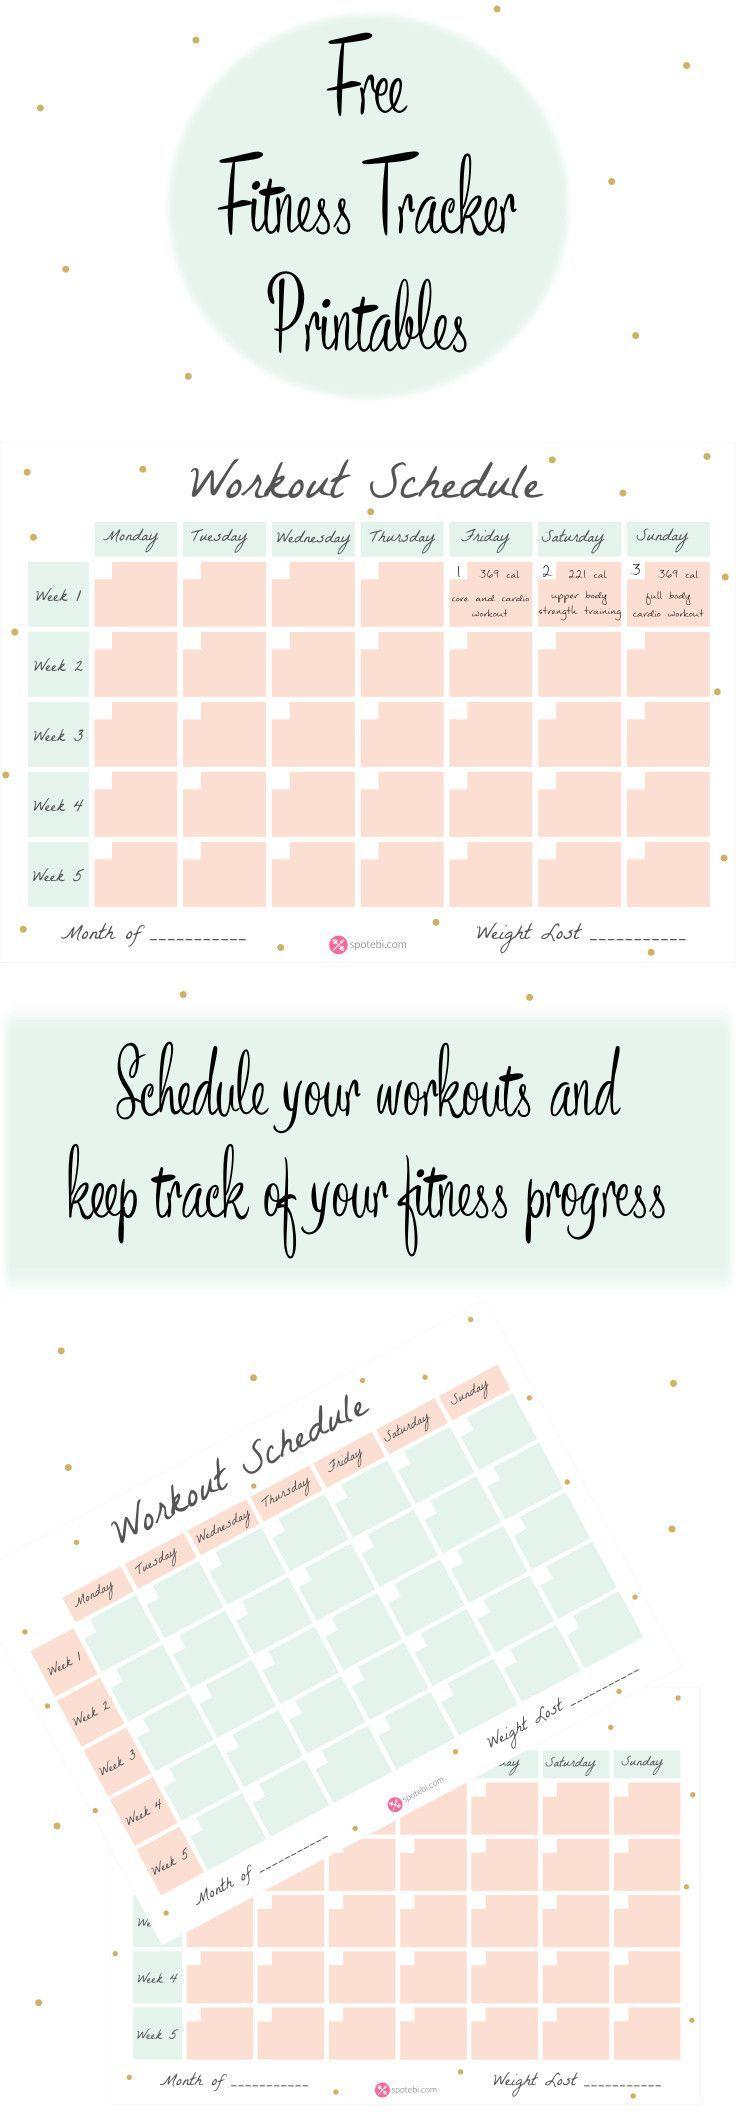 workout schedule template schedule templates workout schedule and workout plans. Black Bedroom Furniture Sets. Home Design Ideas